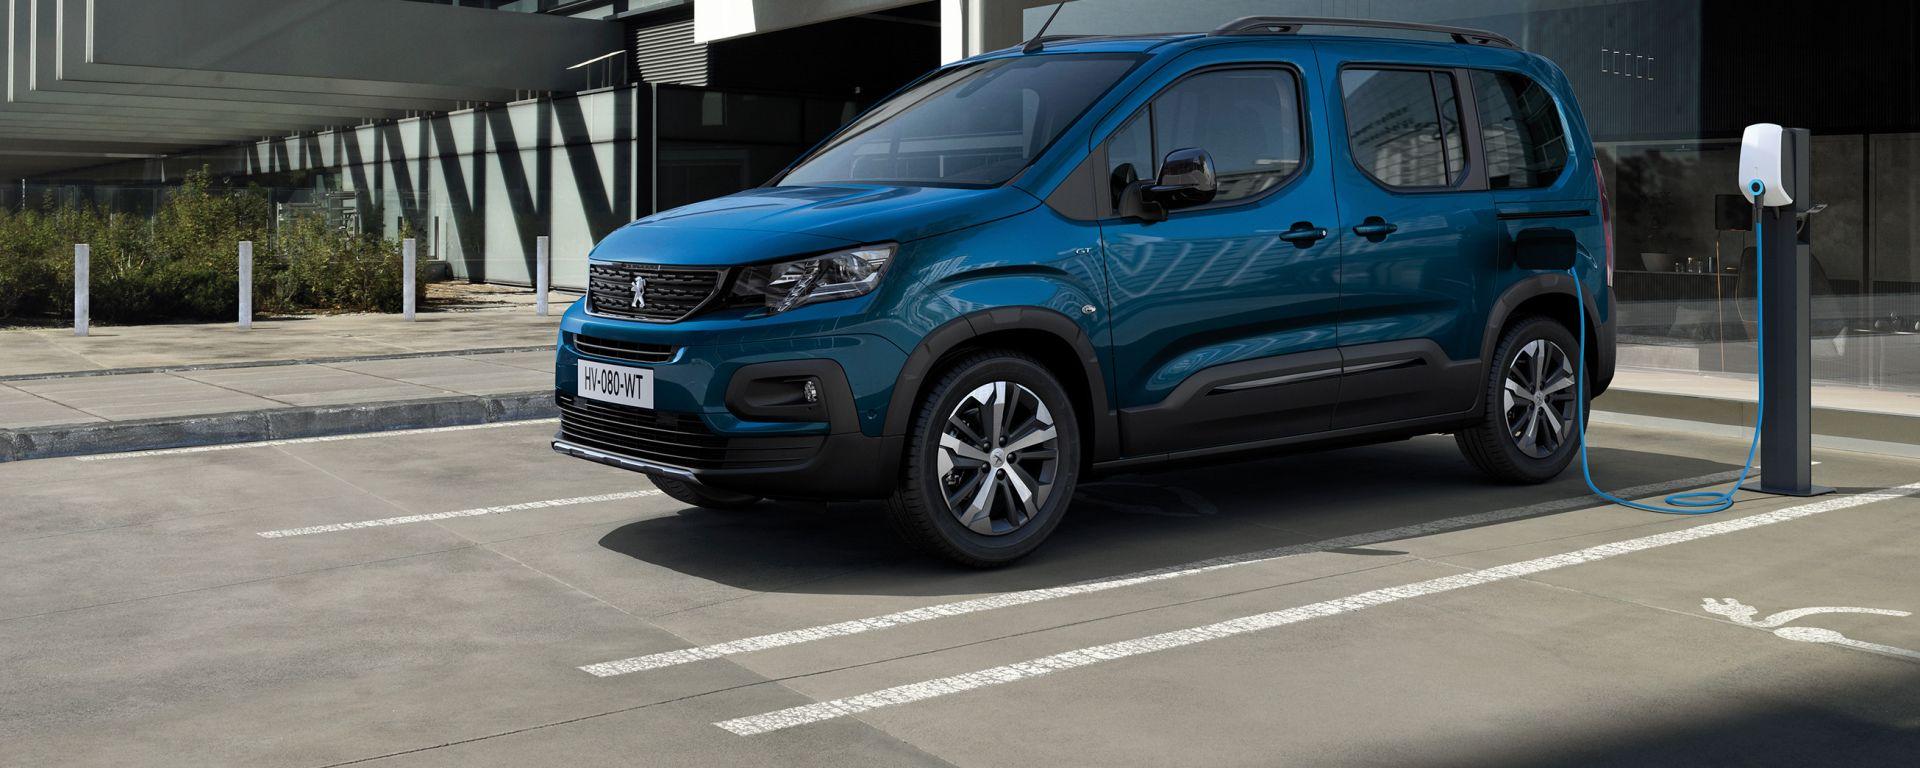 Nuova Peugeot e-Rifter, via agli ordini